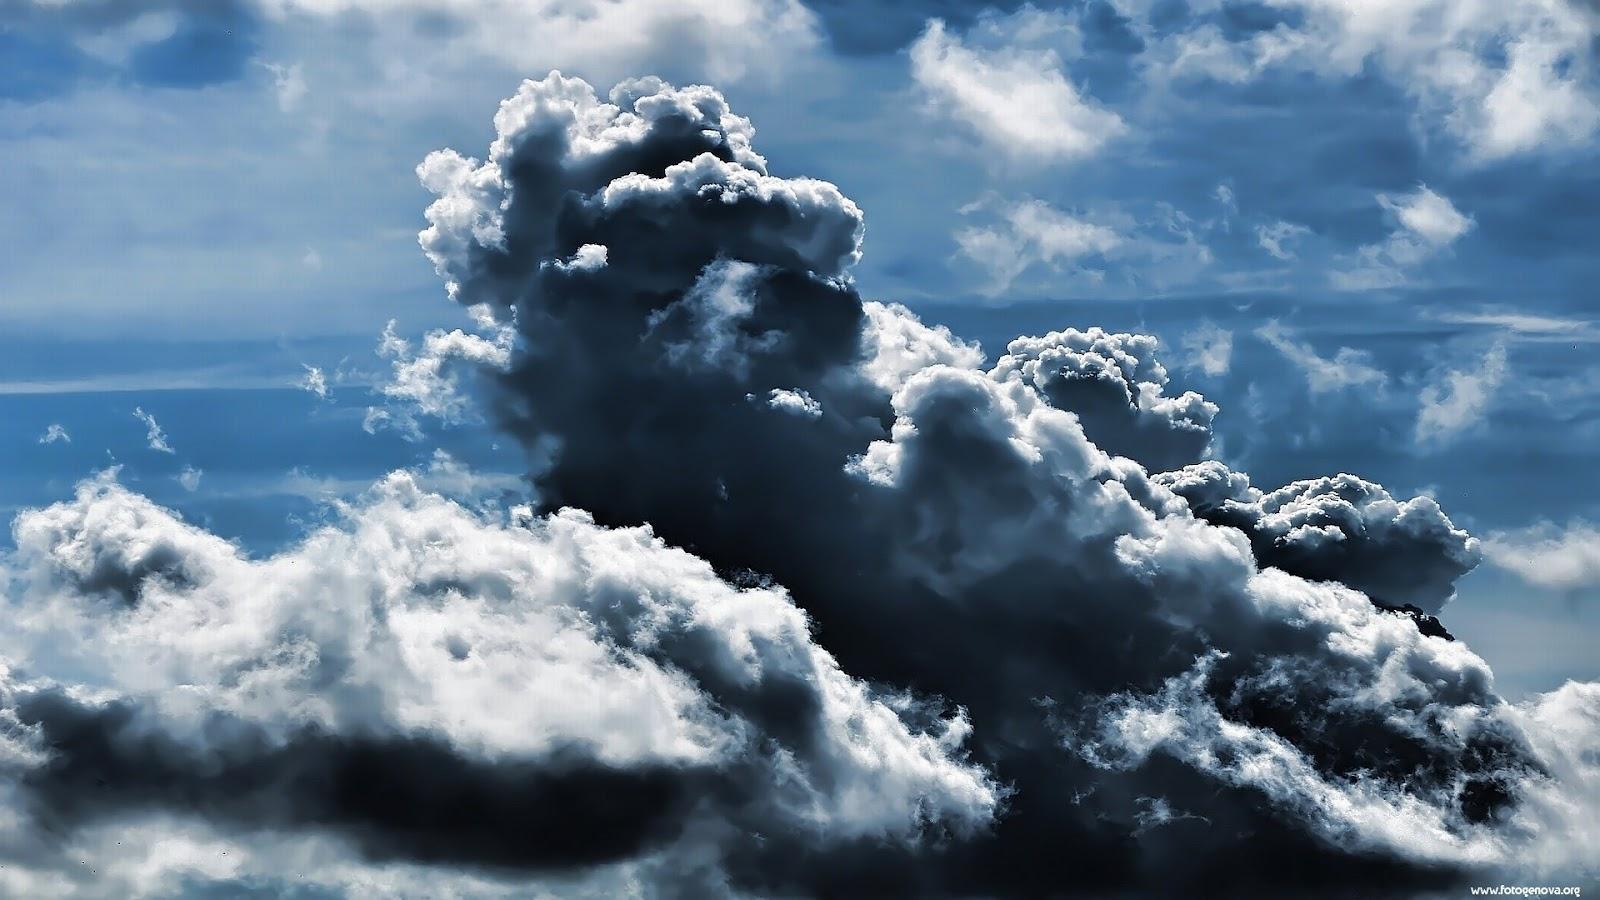 Cloud 9 Wallpaper New Fresh Pubg Wallpaper Hd Wallpaper: Kane Blog Picz: Ultra Hd Wallpapers 1080p